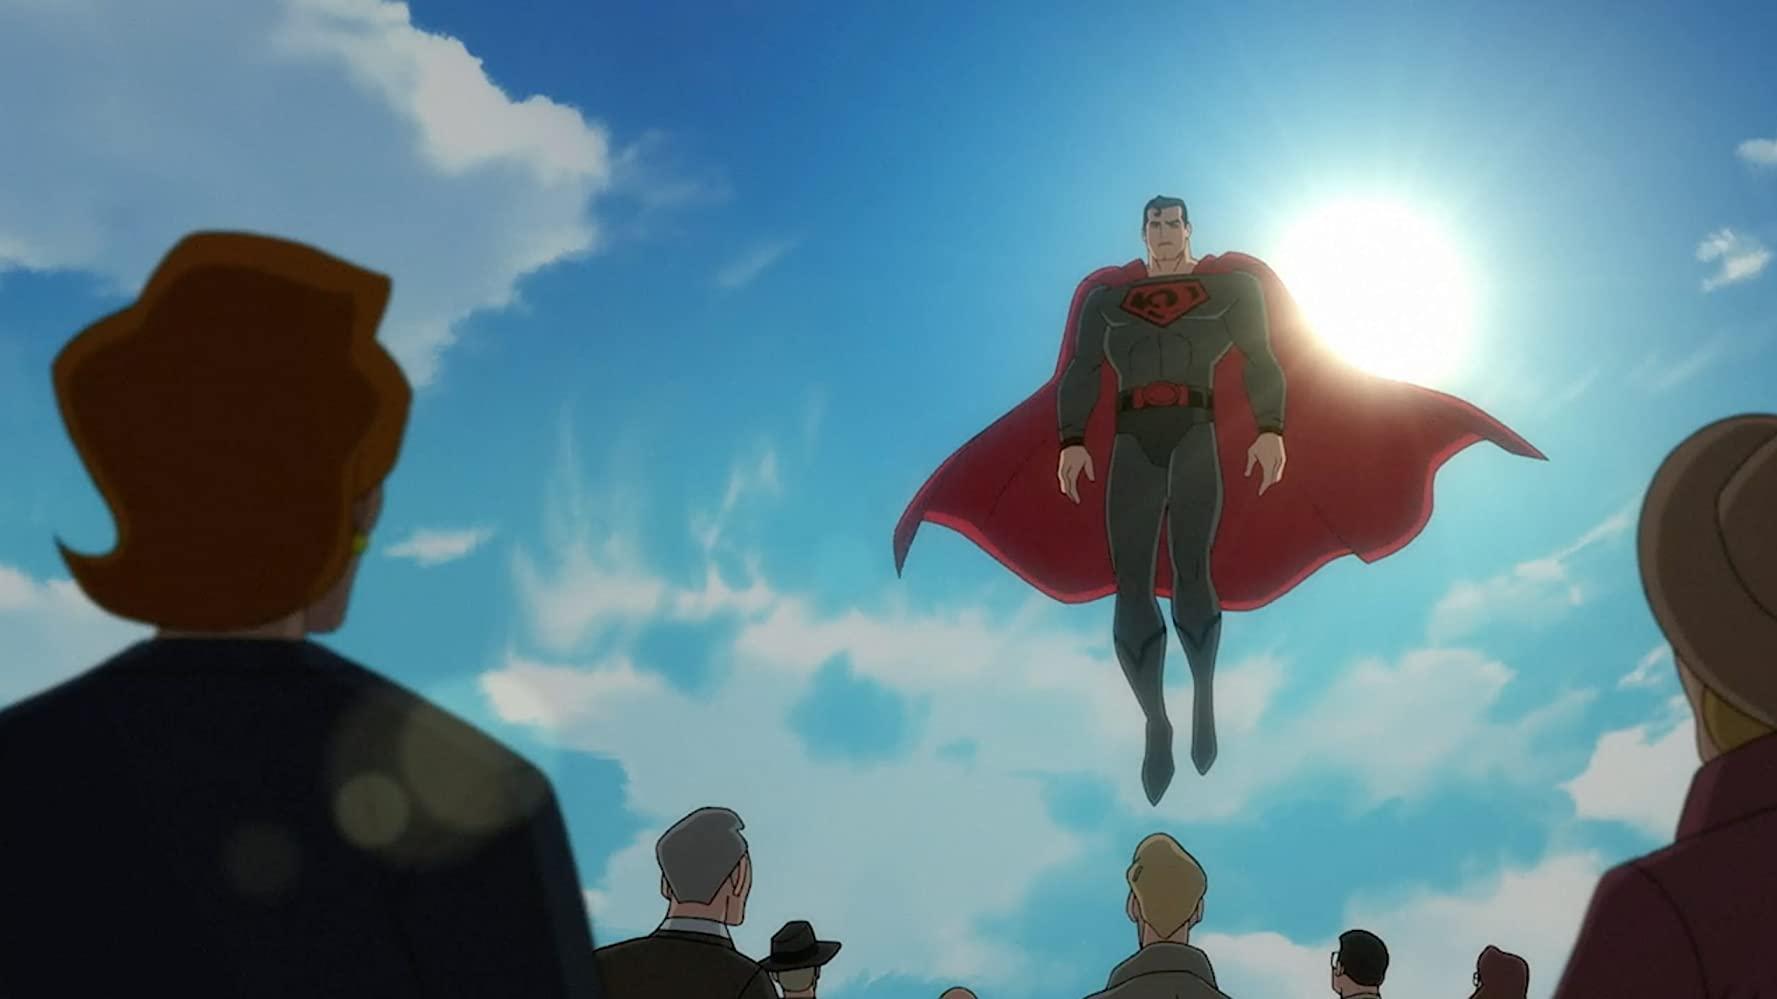 مشاهدة فيلم Superman Red Son (2020) مترجم HD اون لاين